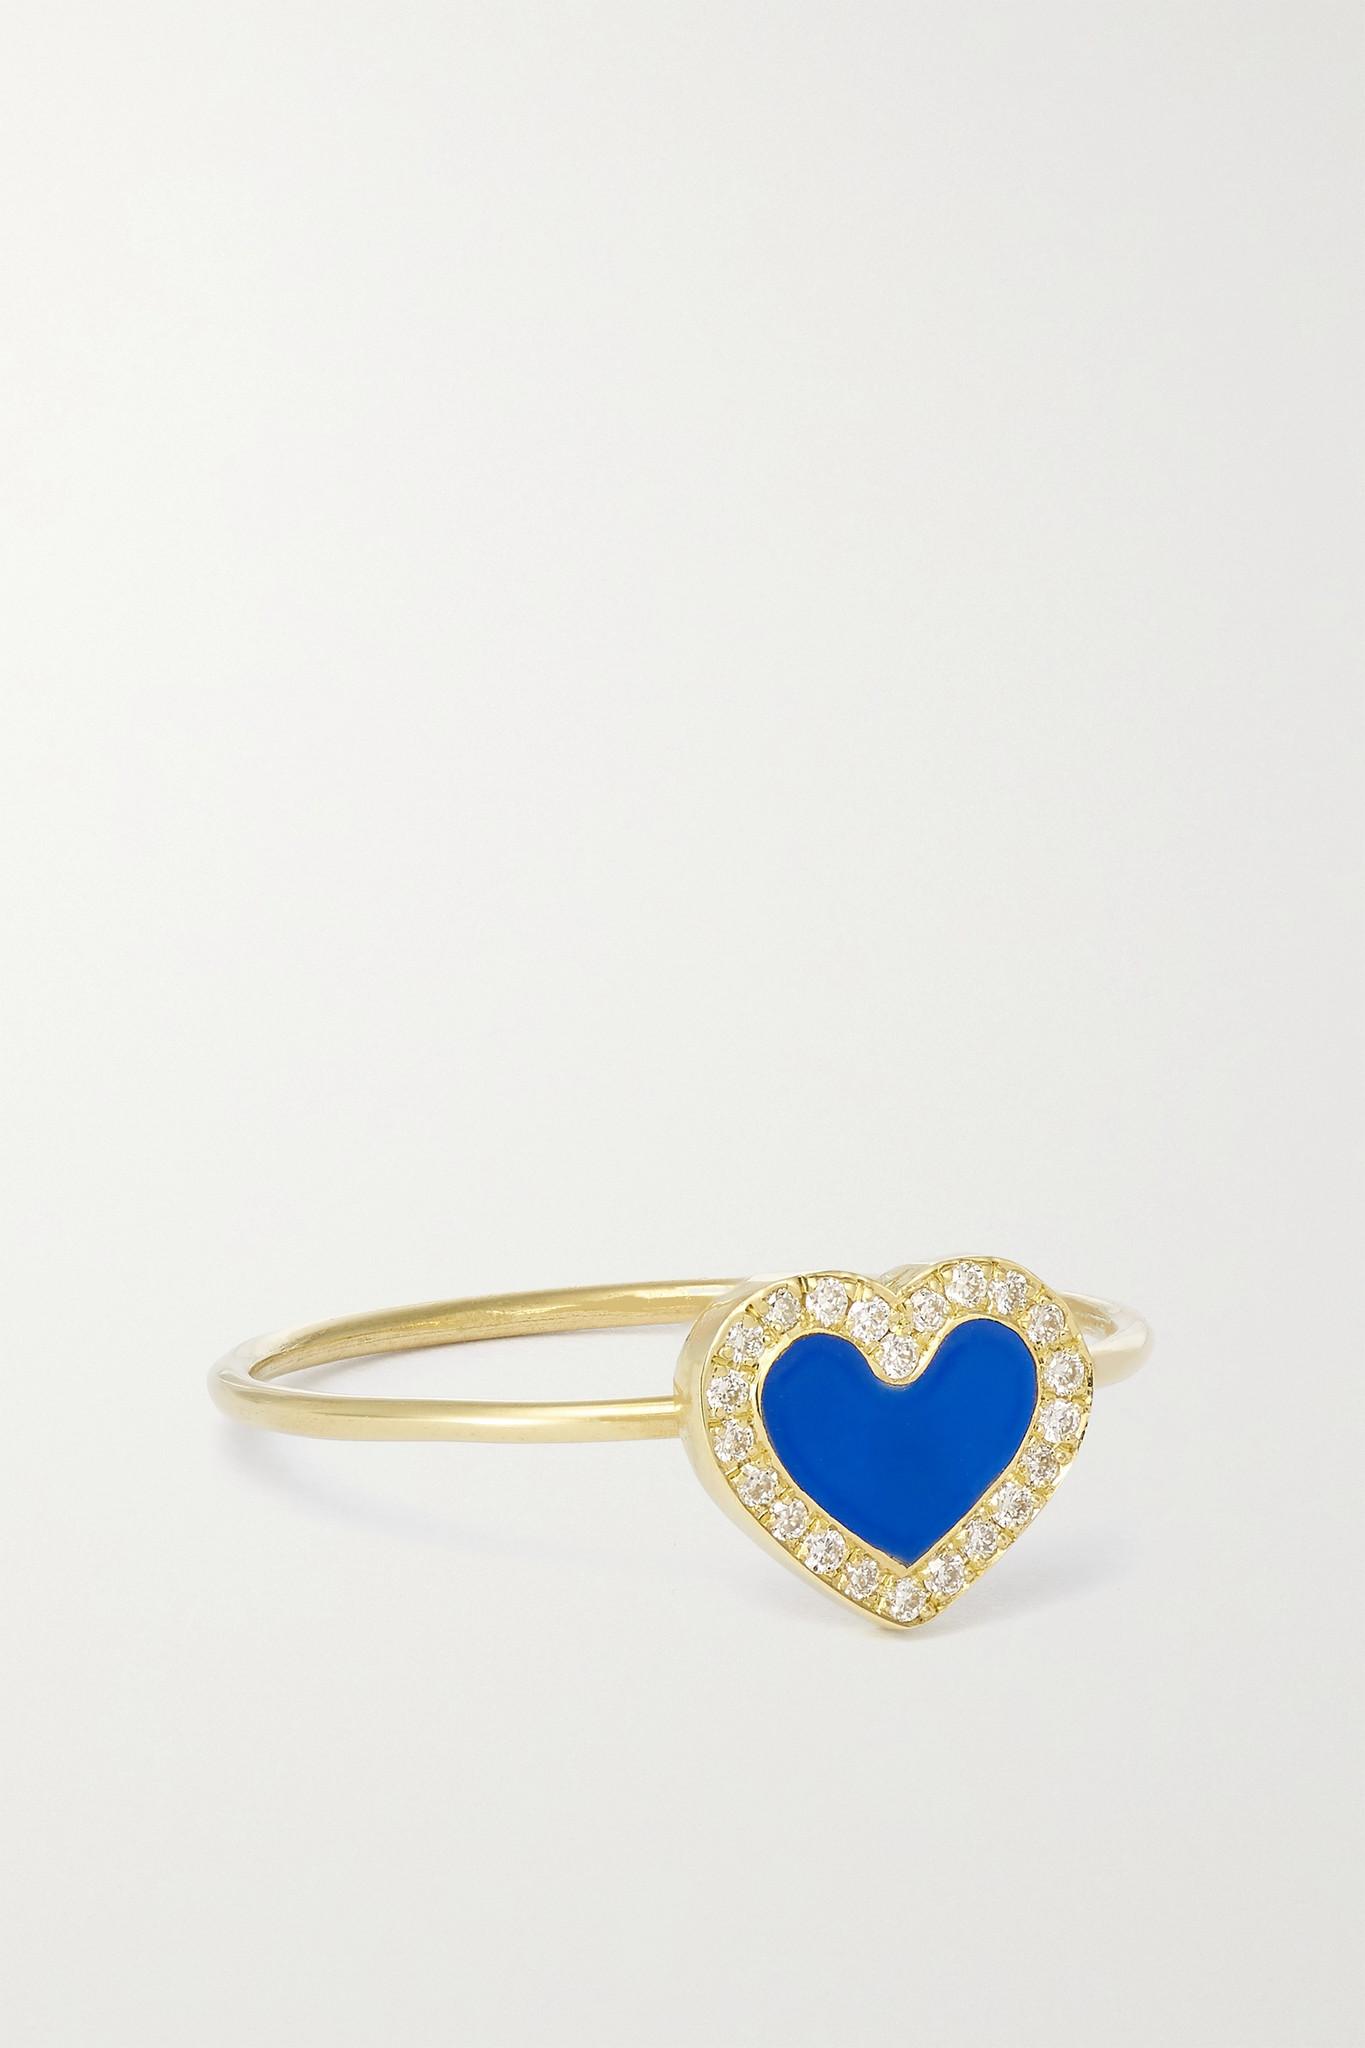 JENNIFER MEYER - Extra Small Heart 18-karat Gold, Lapis Lazuli And Diamond Ring - 6